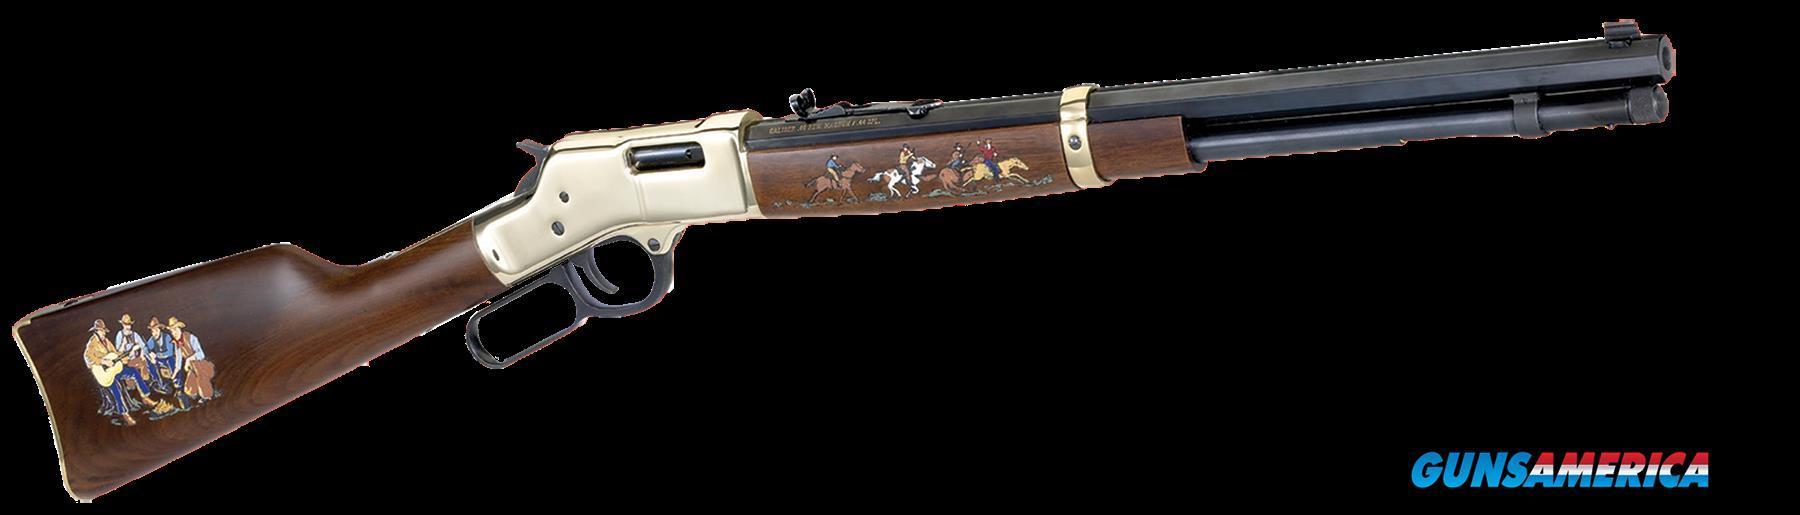 Henry Big Boy, Henry H006cb2   Big Boy Cowboy2  45lc  Guns > Pistols > 1911 Pistol Copies (non-Colt)